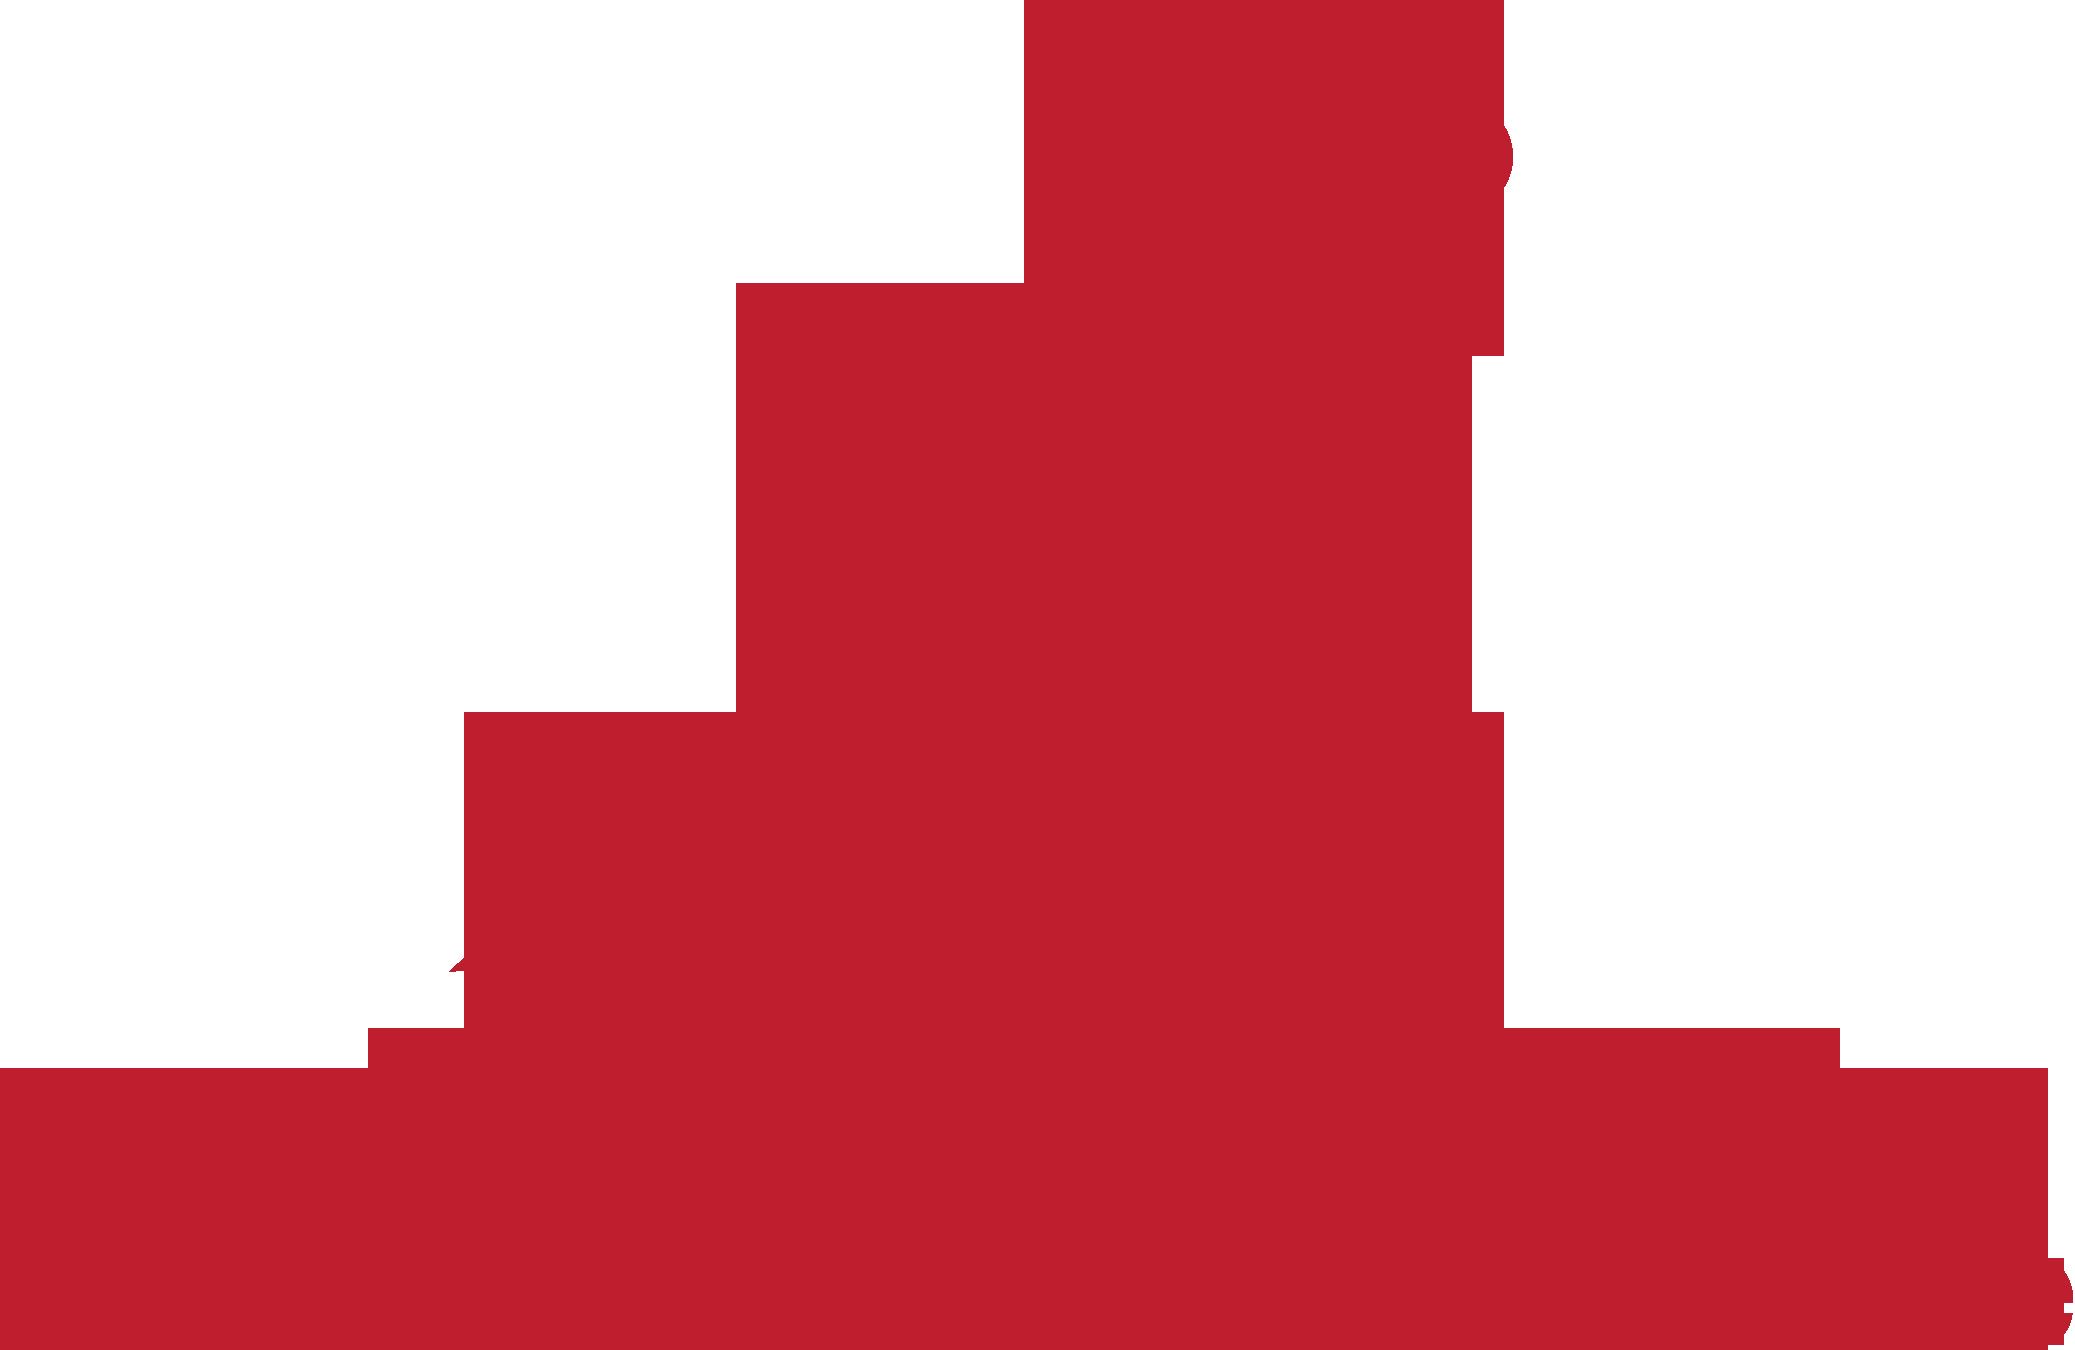 logo Castillon la bataille